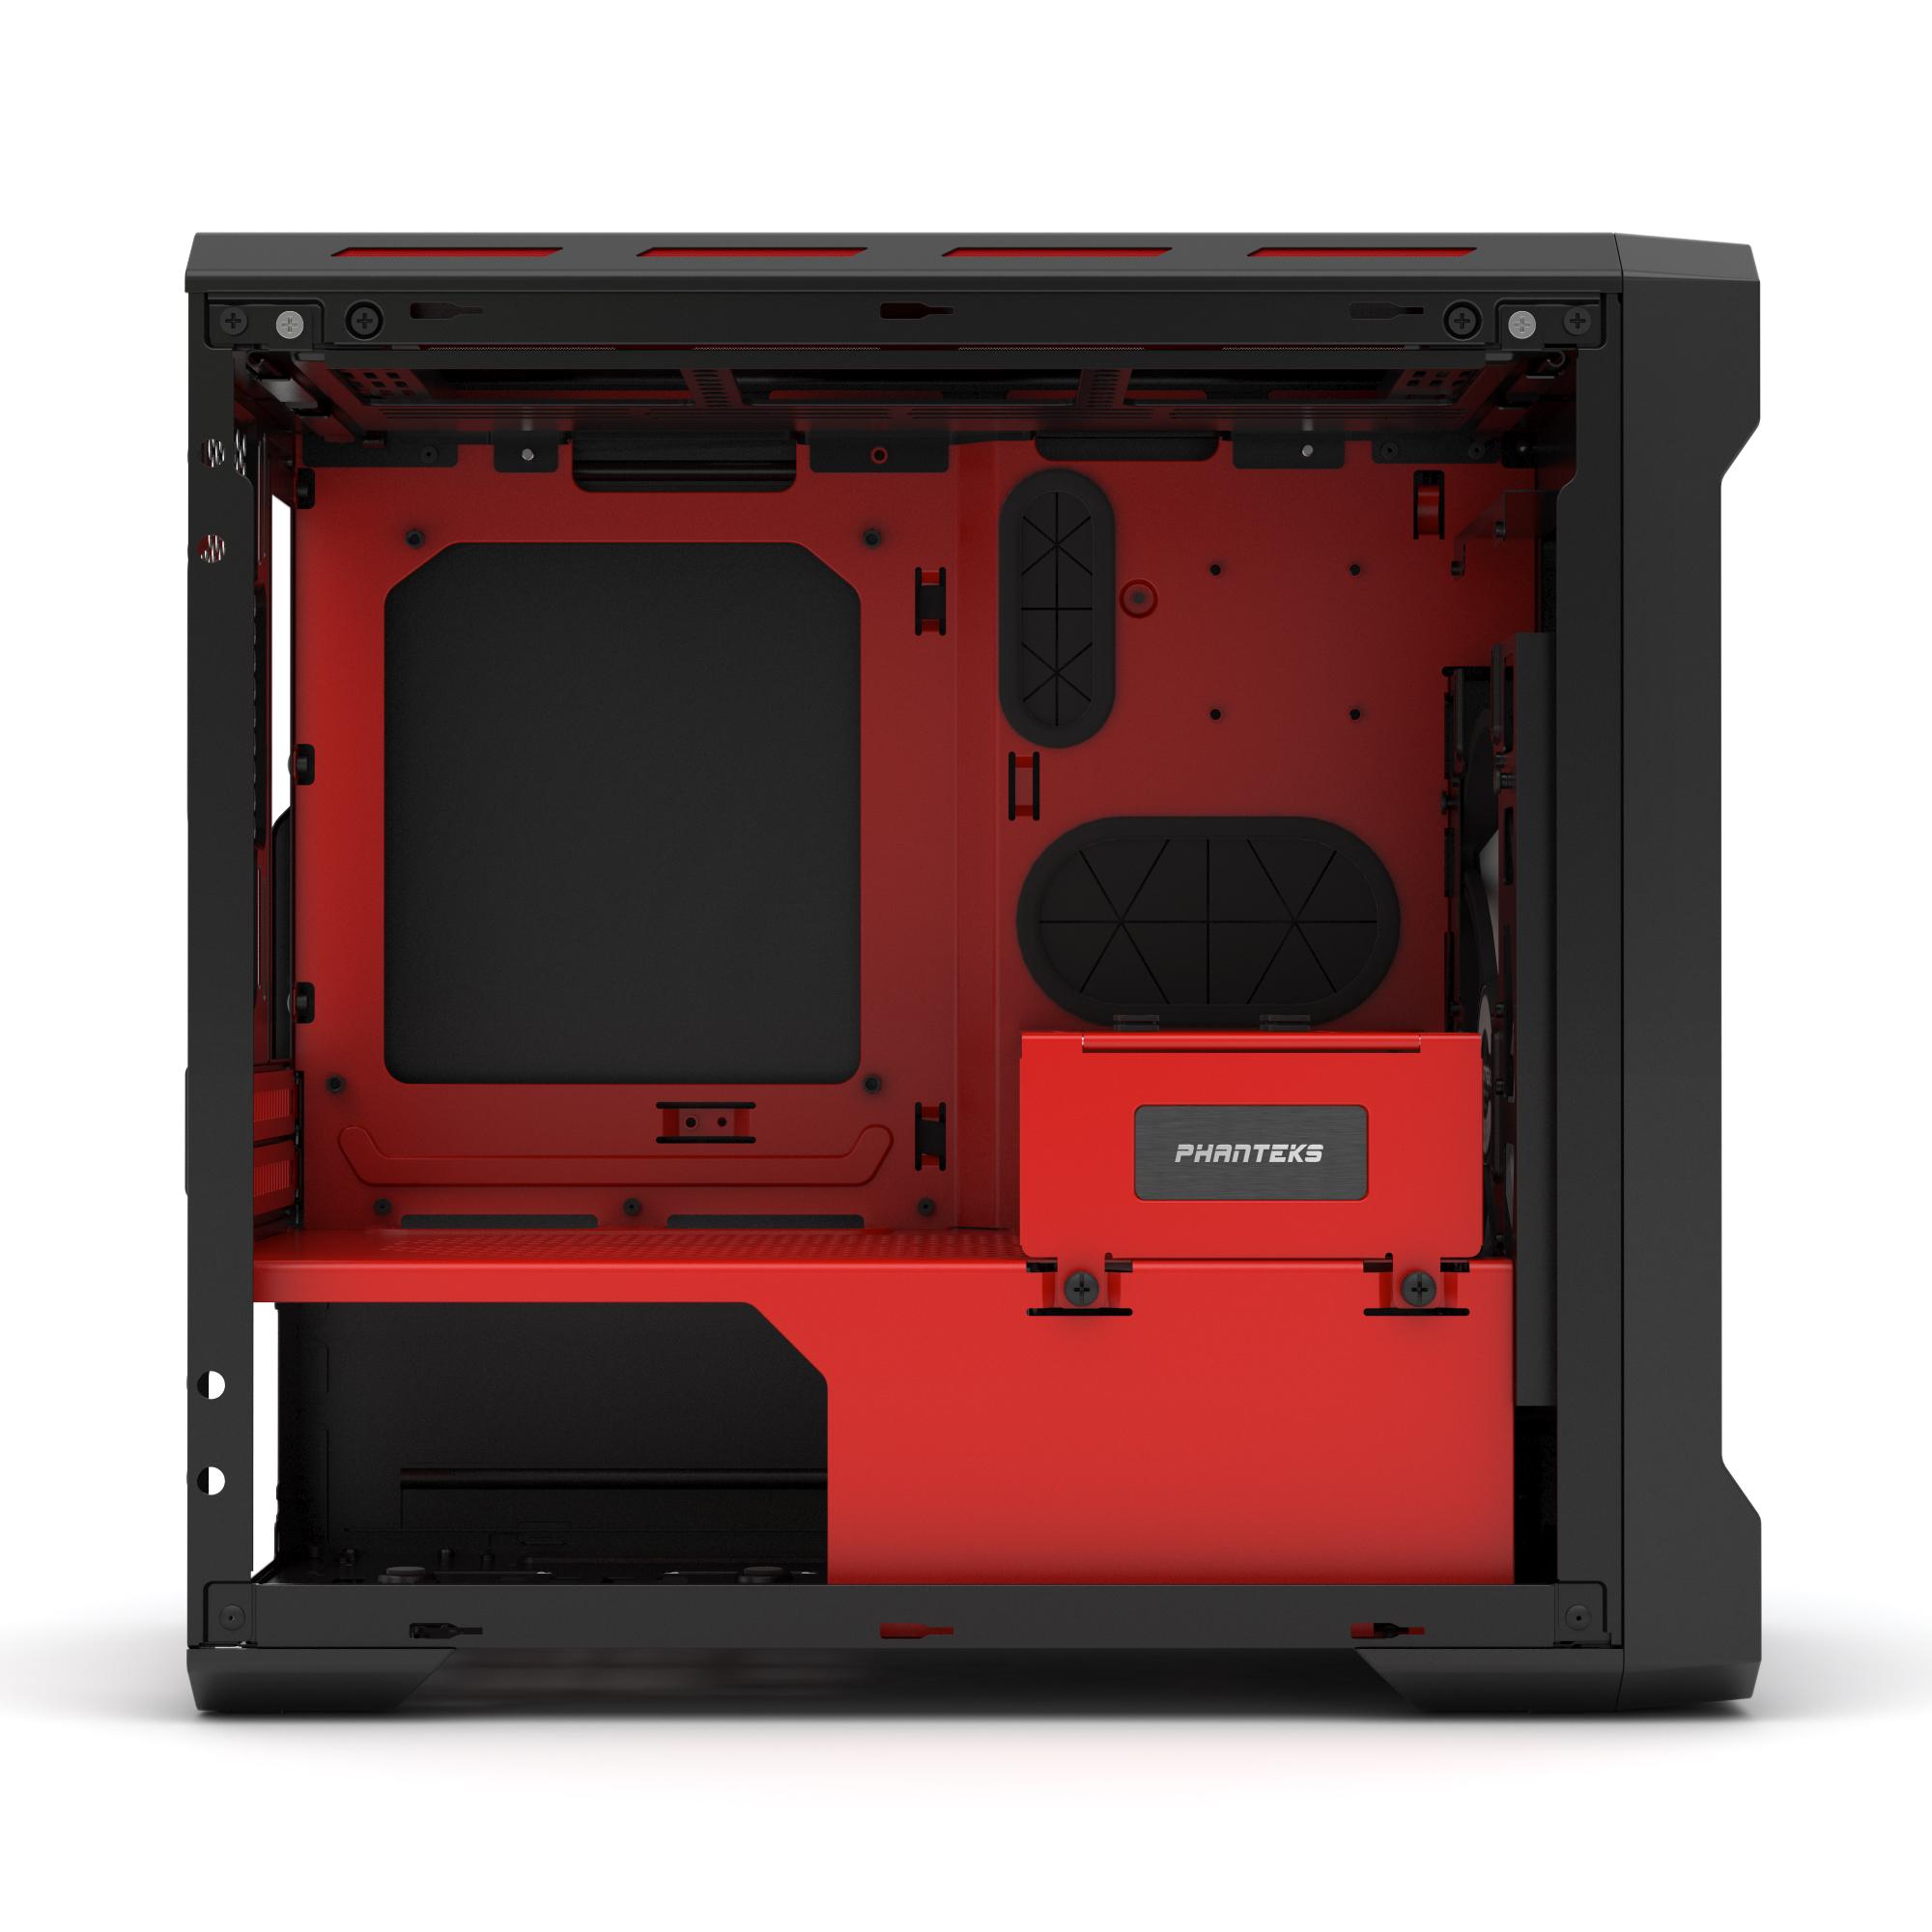 evolv-itx-steel-black-red-left-view-open-2k.jpeg